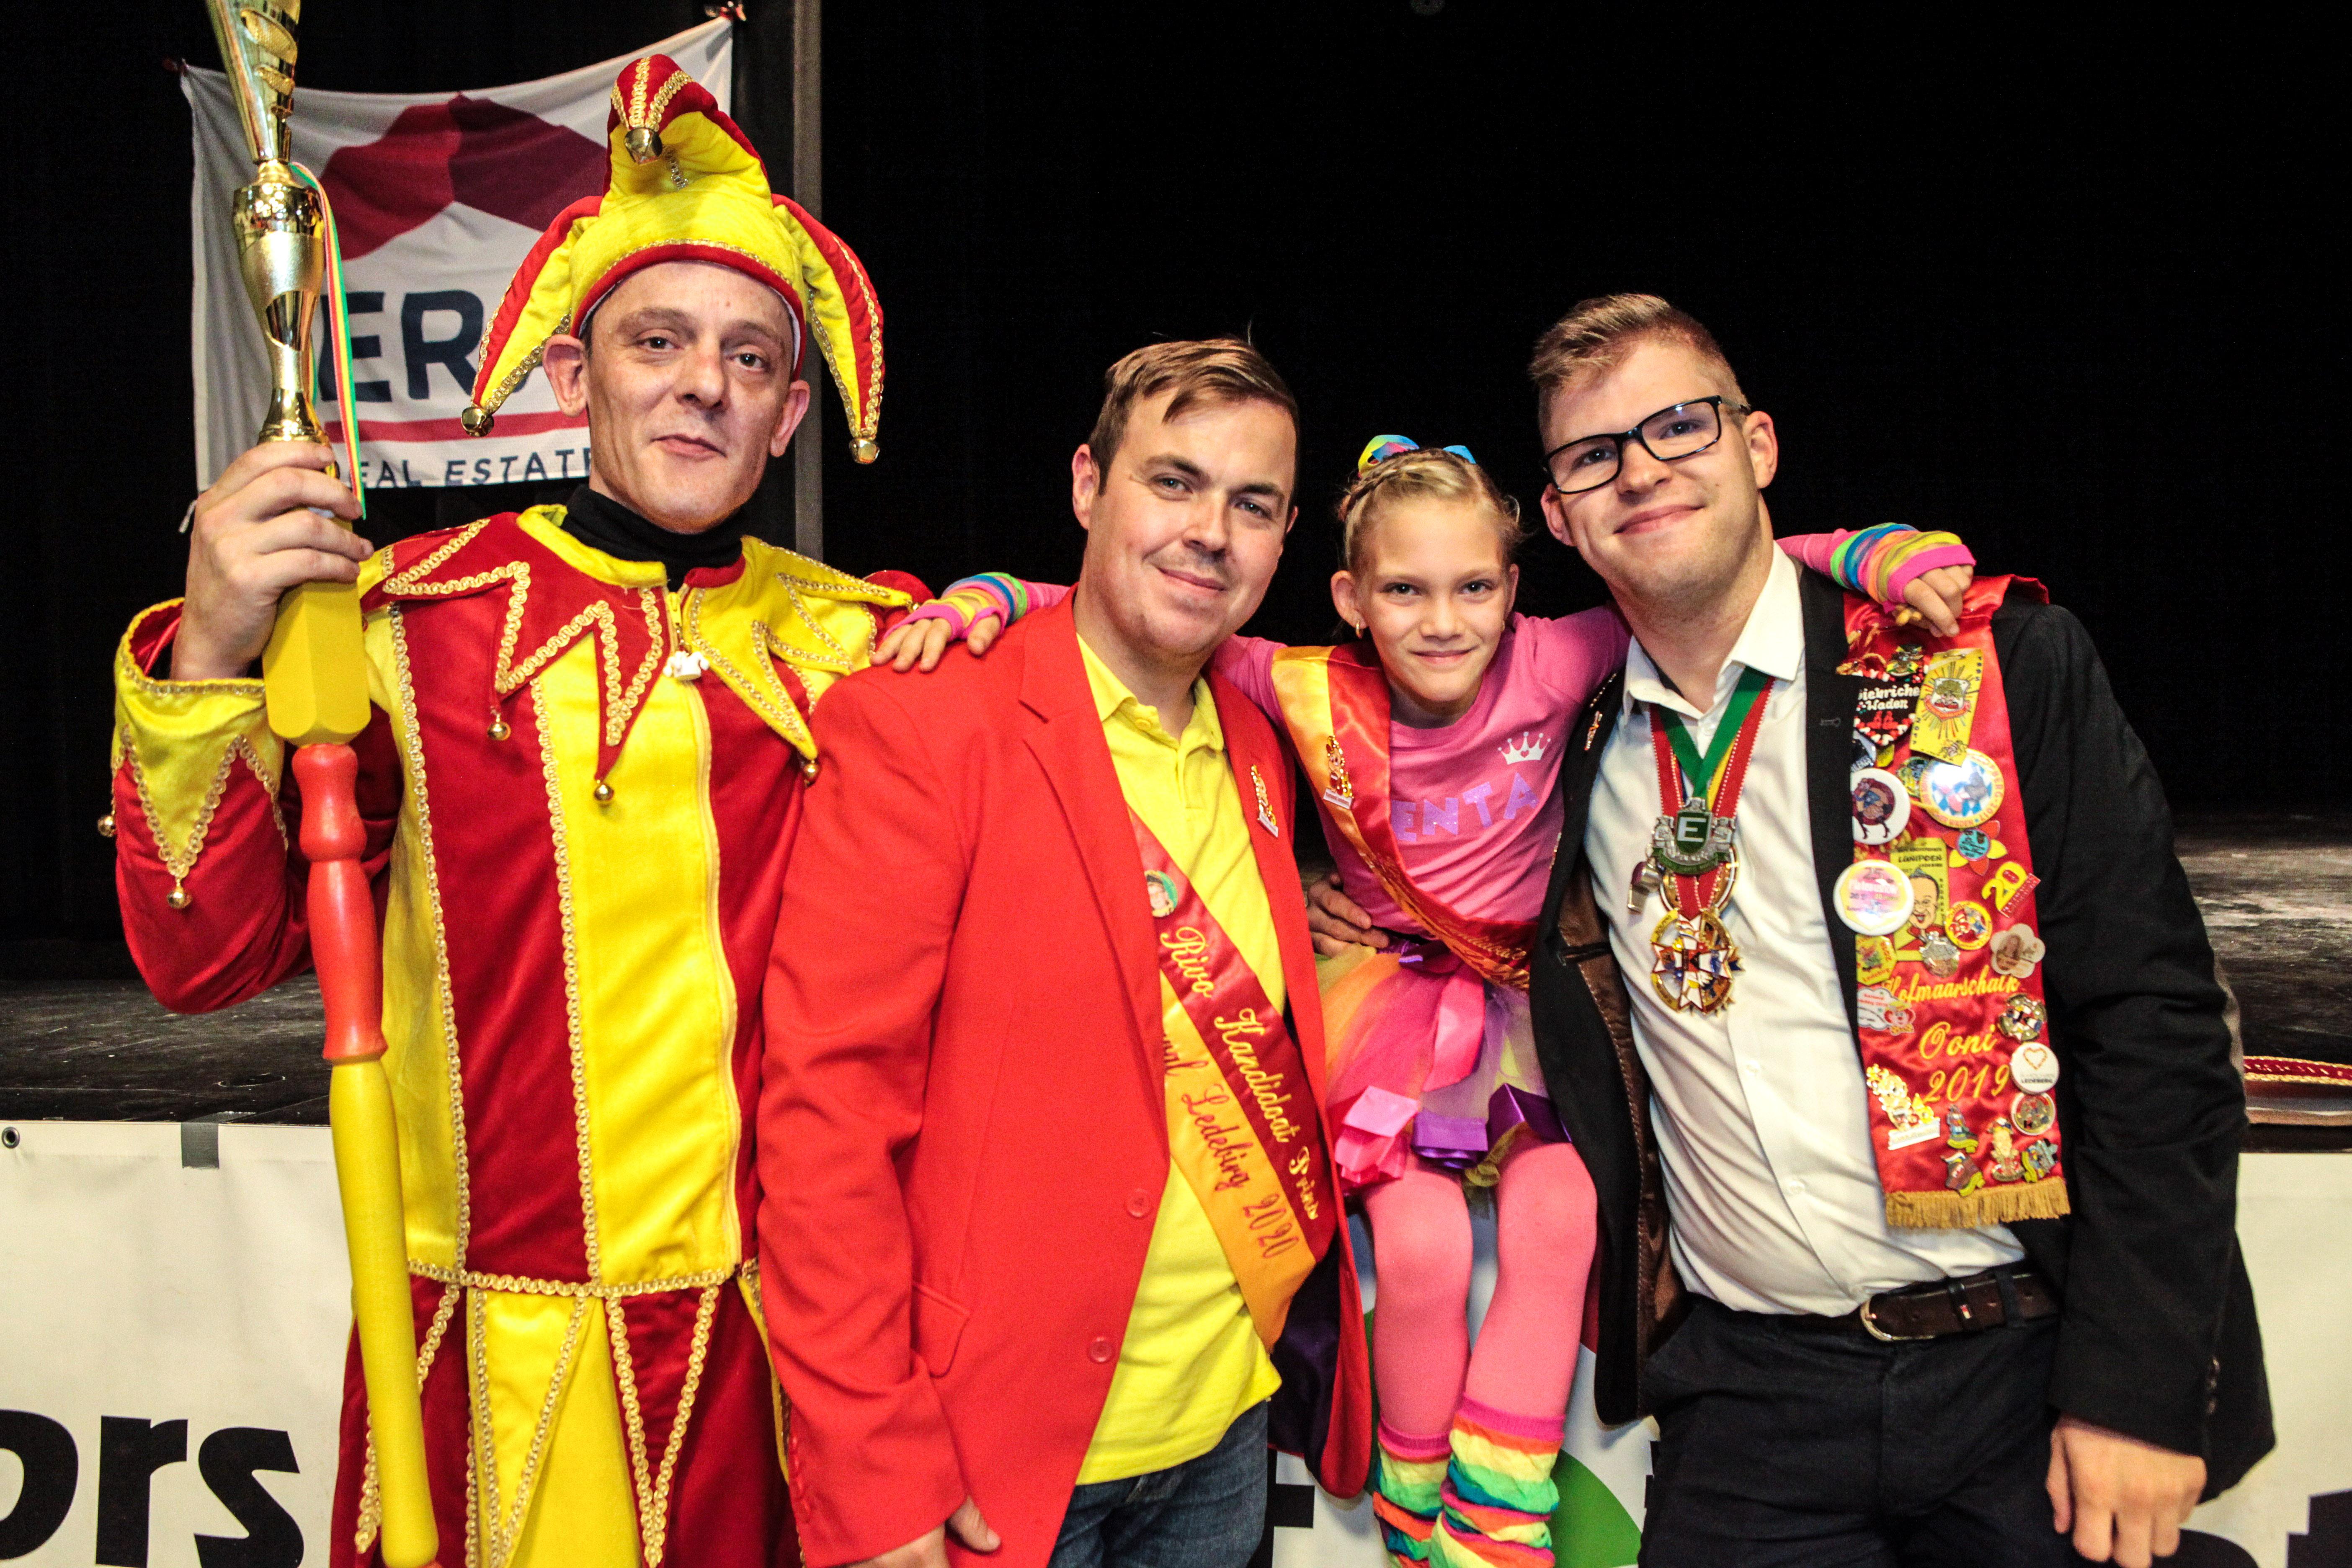 Carnaval Ledeberg van start met twee kandidaten